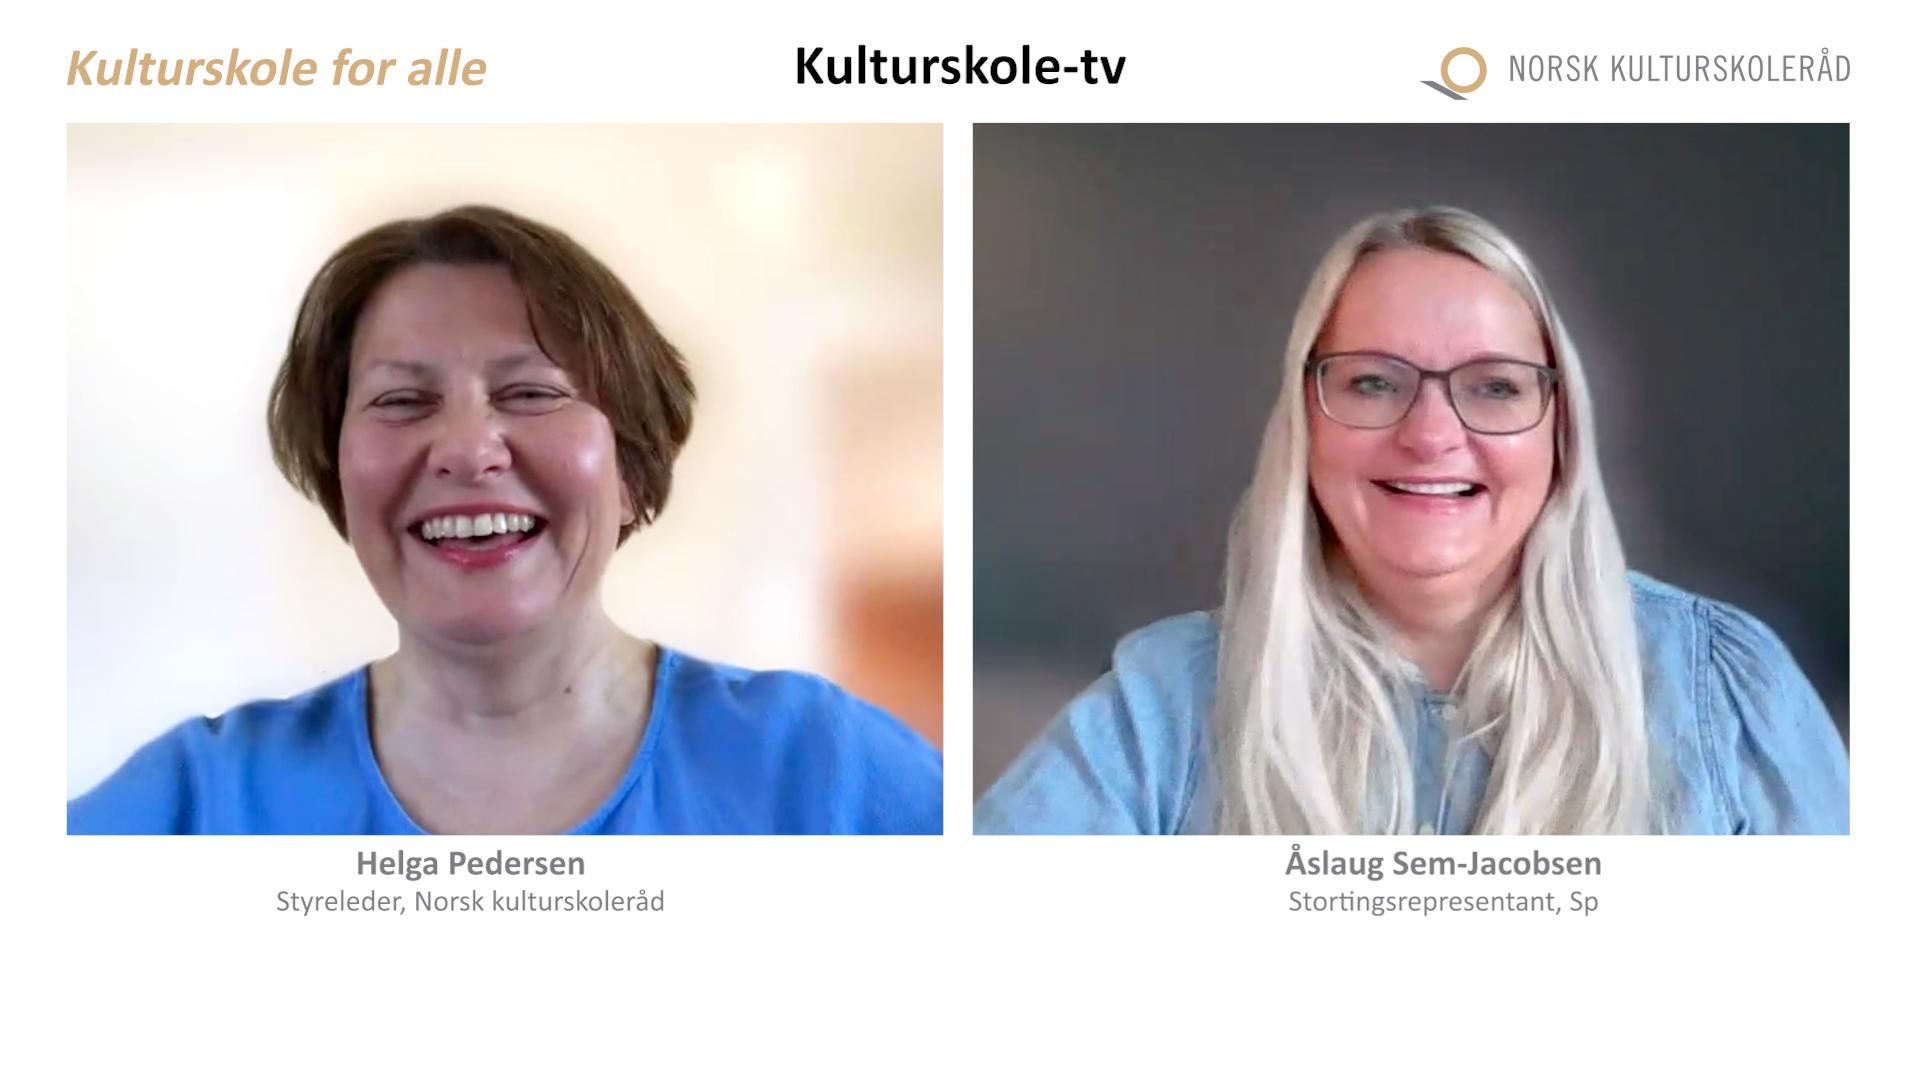 2021 Kulturskole-tv Åslaug Sem-Jacobsen 18.5.png